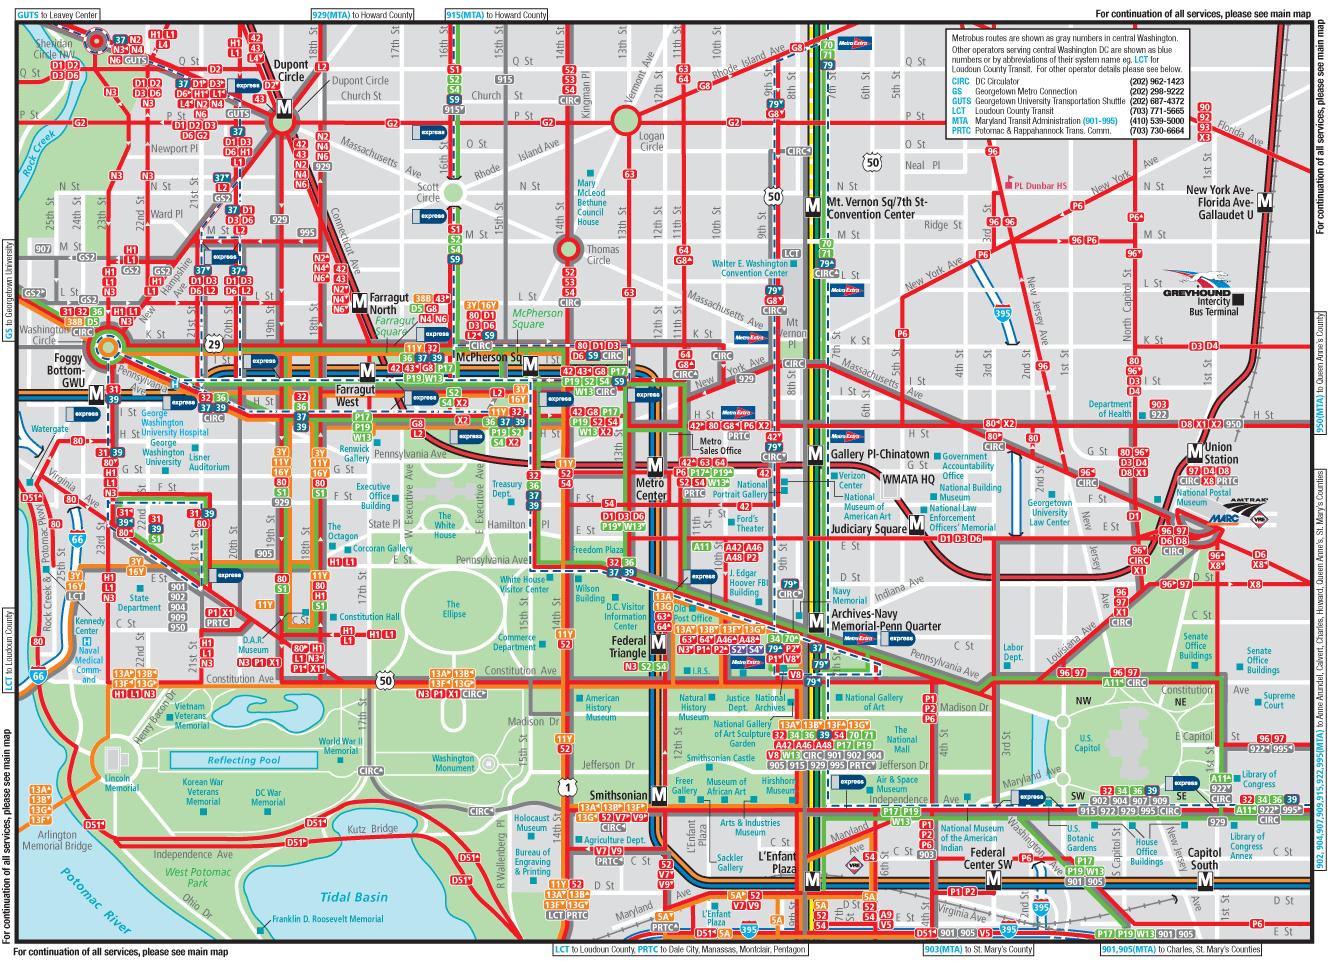 Washington Dc Downtown Metrobus Map City Center